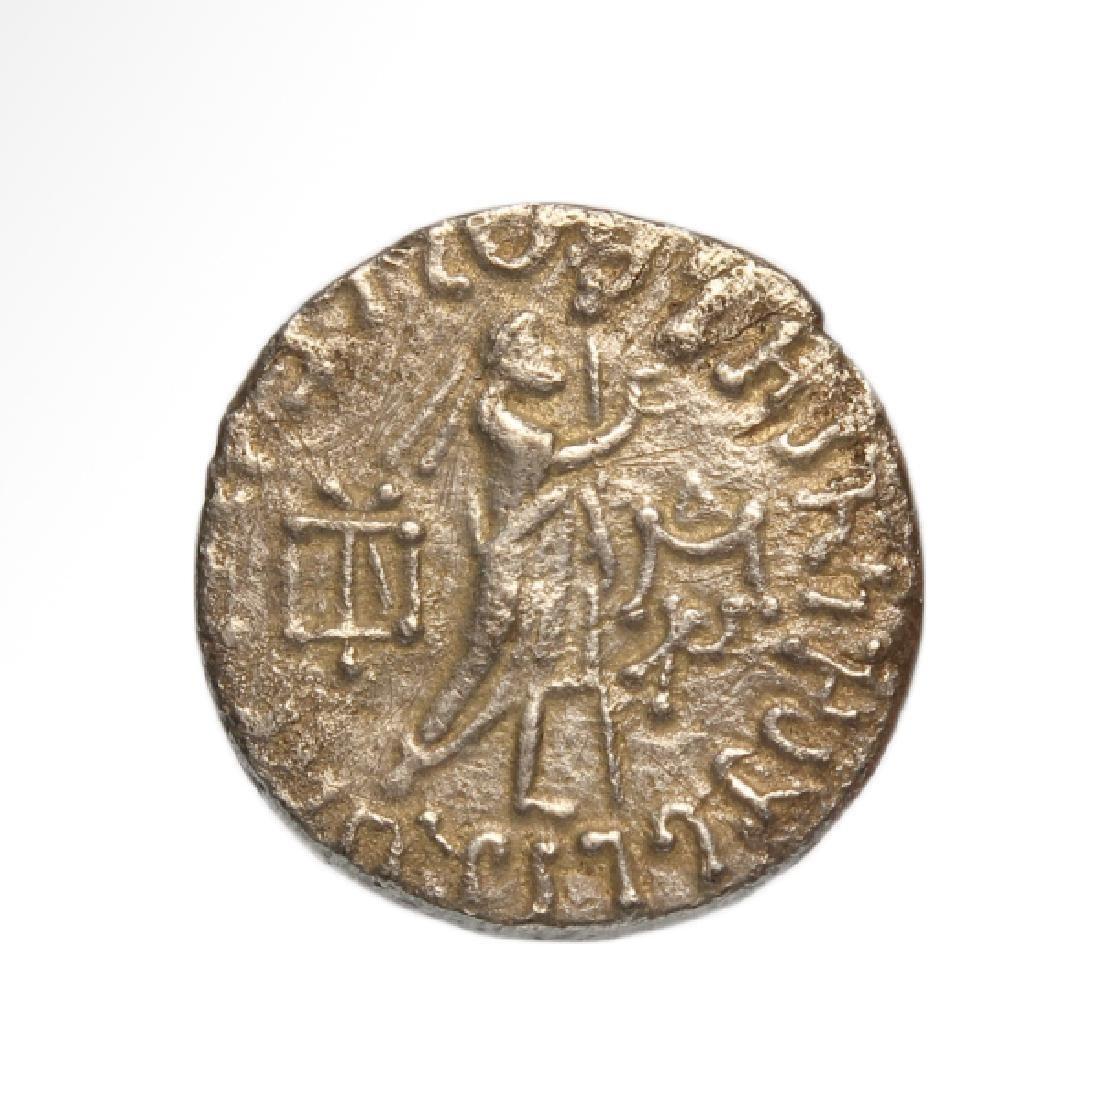 Silver Bactrian Greek Tetradrachm King Azes I 58-20 BC - 2